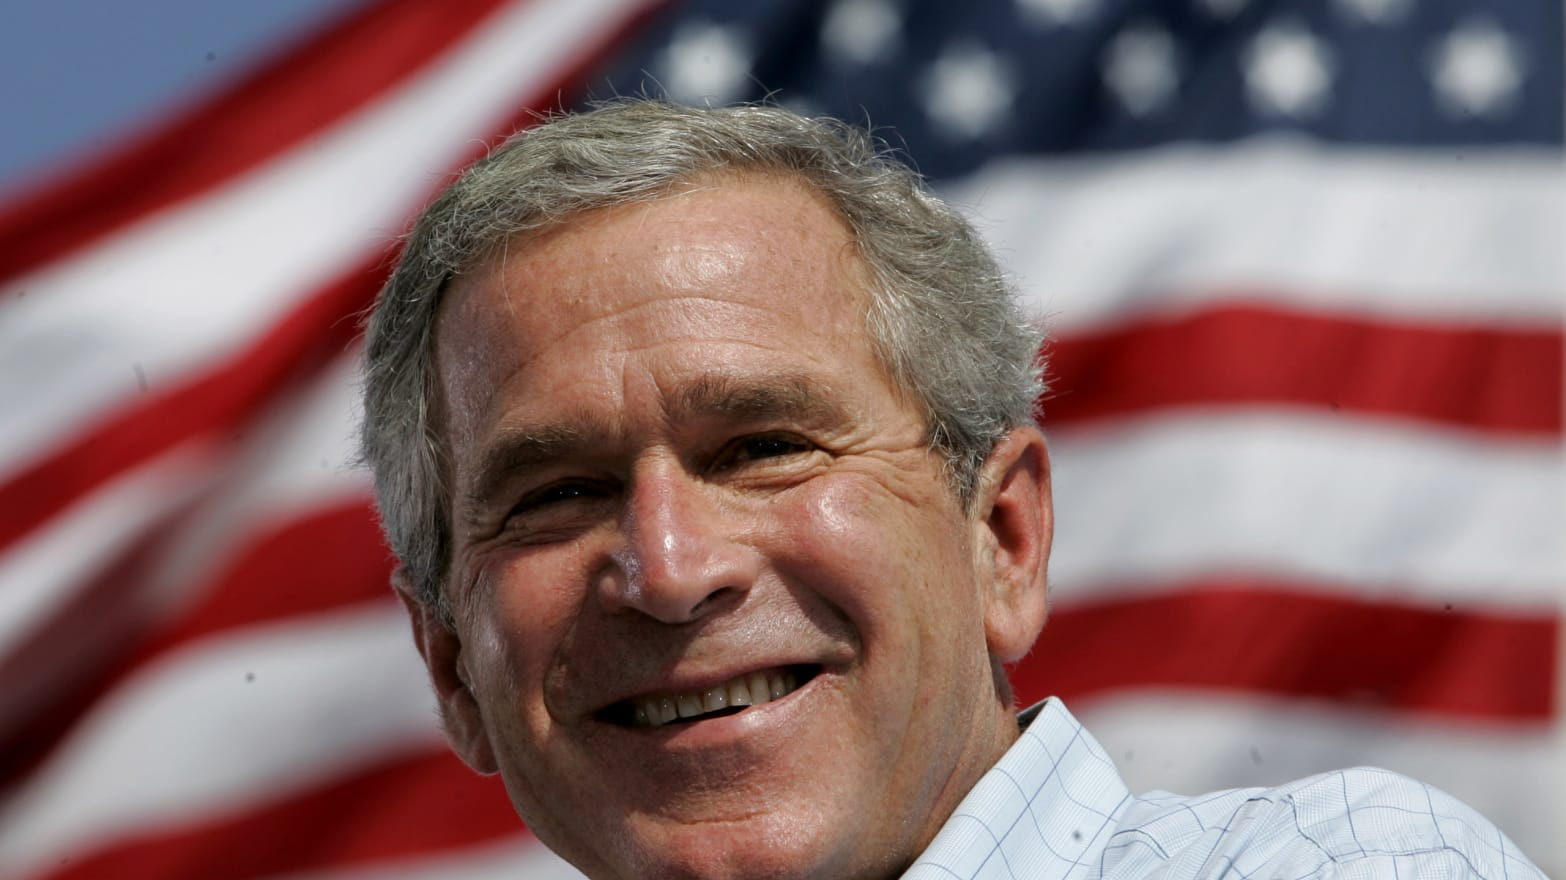 Bush profile: A cheerleader turns presidential